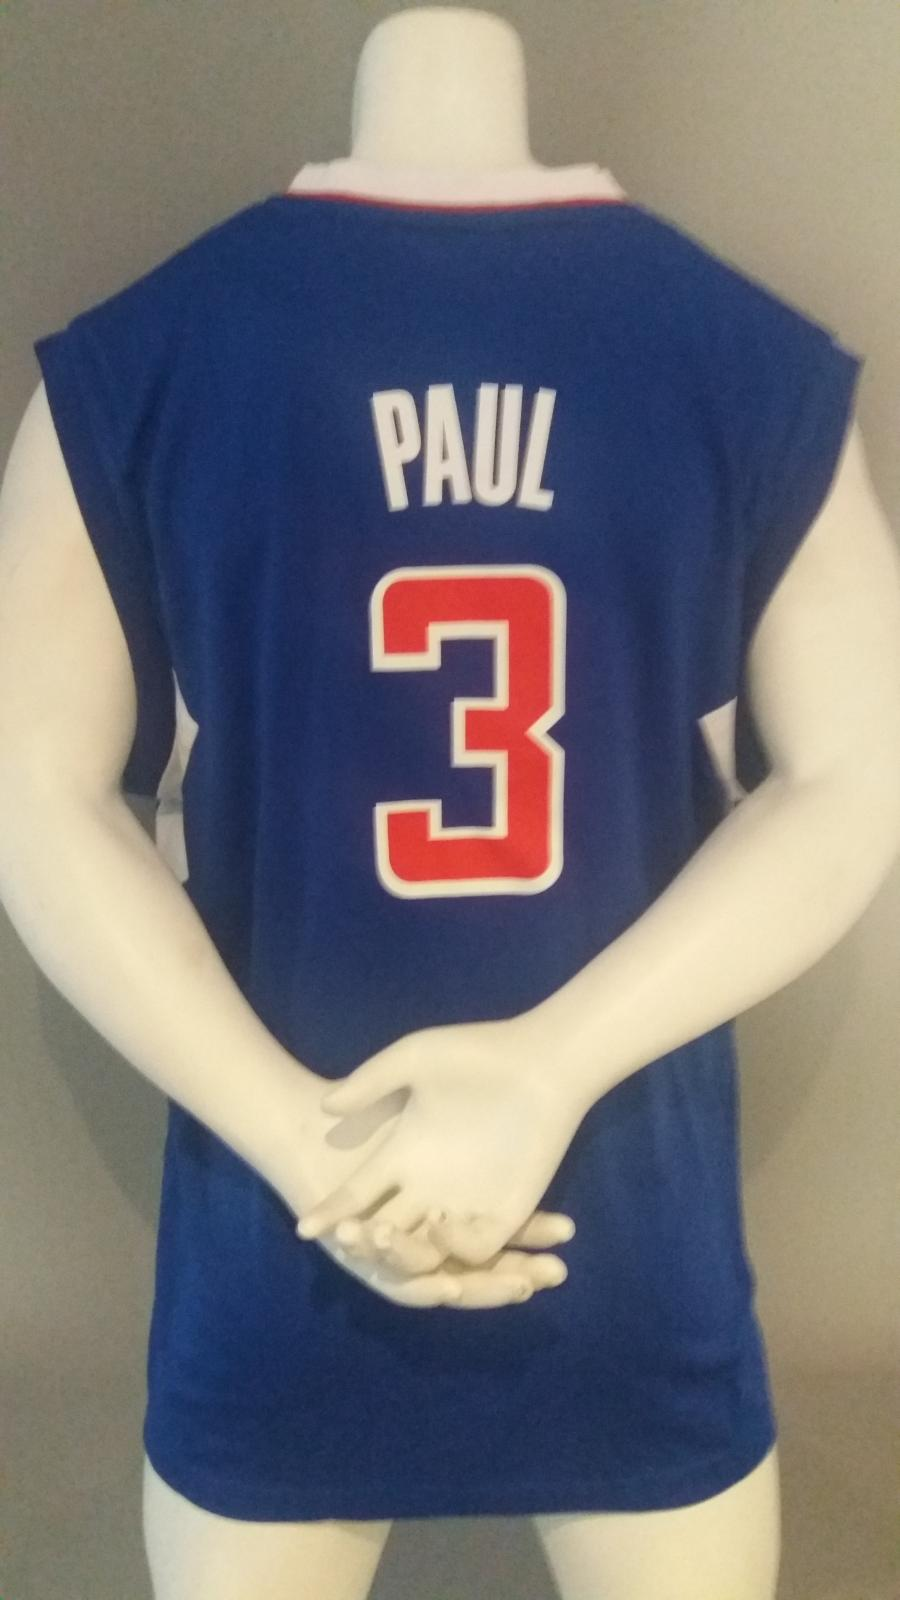 Jersey - Replica - Hombre - Chris Paul - LA Clippers - Alternate - Adidas